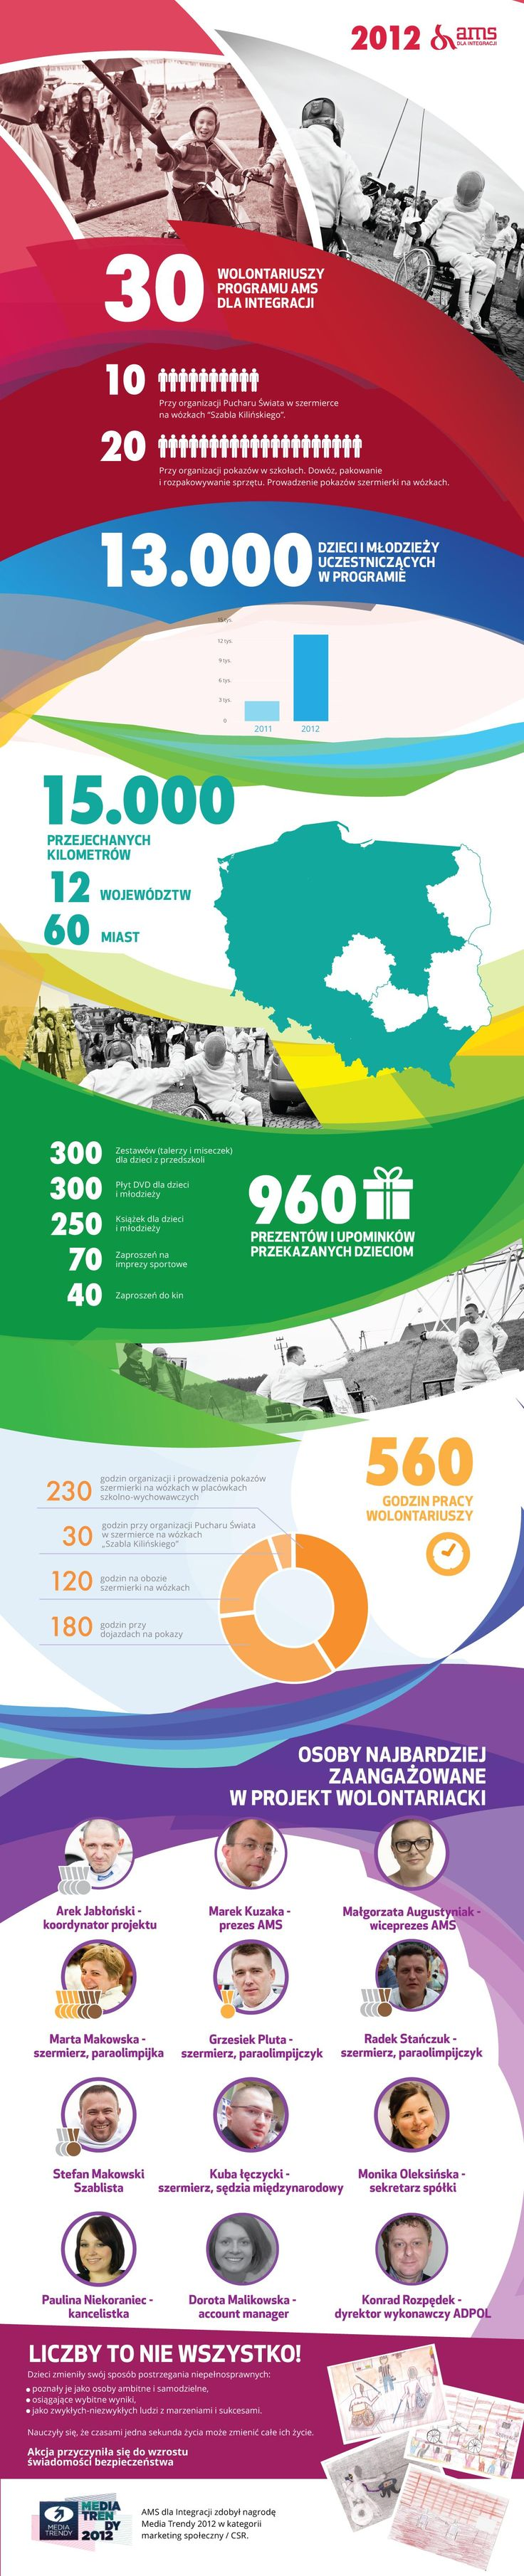 Podsumowanie działań AMS dla Integracji za 2012 rok / The summary of the AMS for Integration's activities within 2012